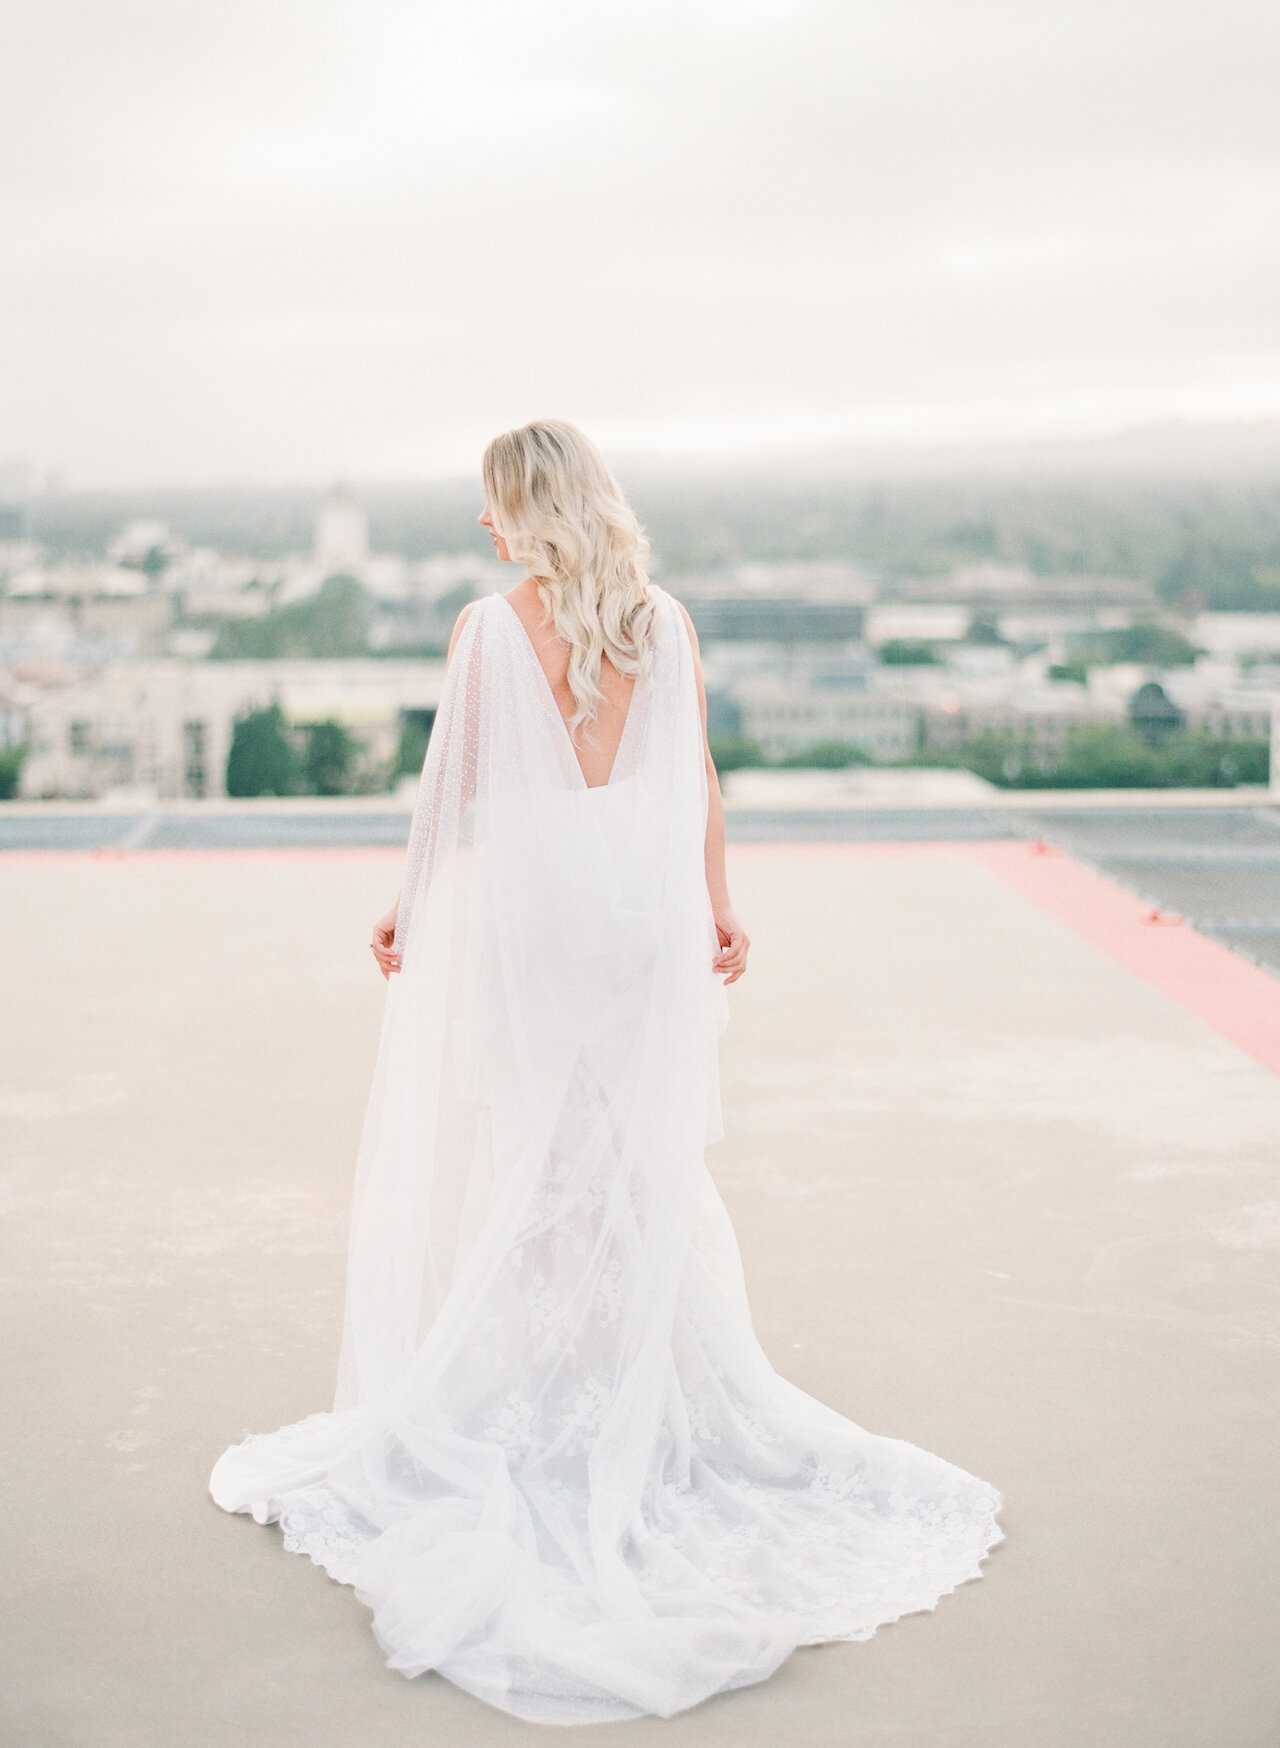 Hylah-White-Shawna-Yamamoto-Koman-Photography-Four-Seaons-Styled-Shoot100.jpg